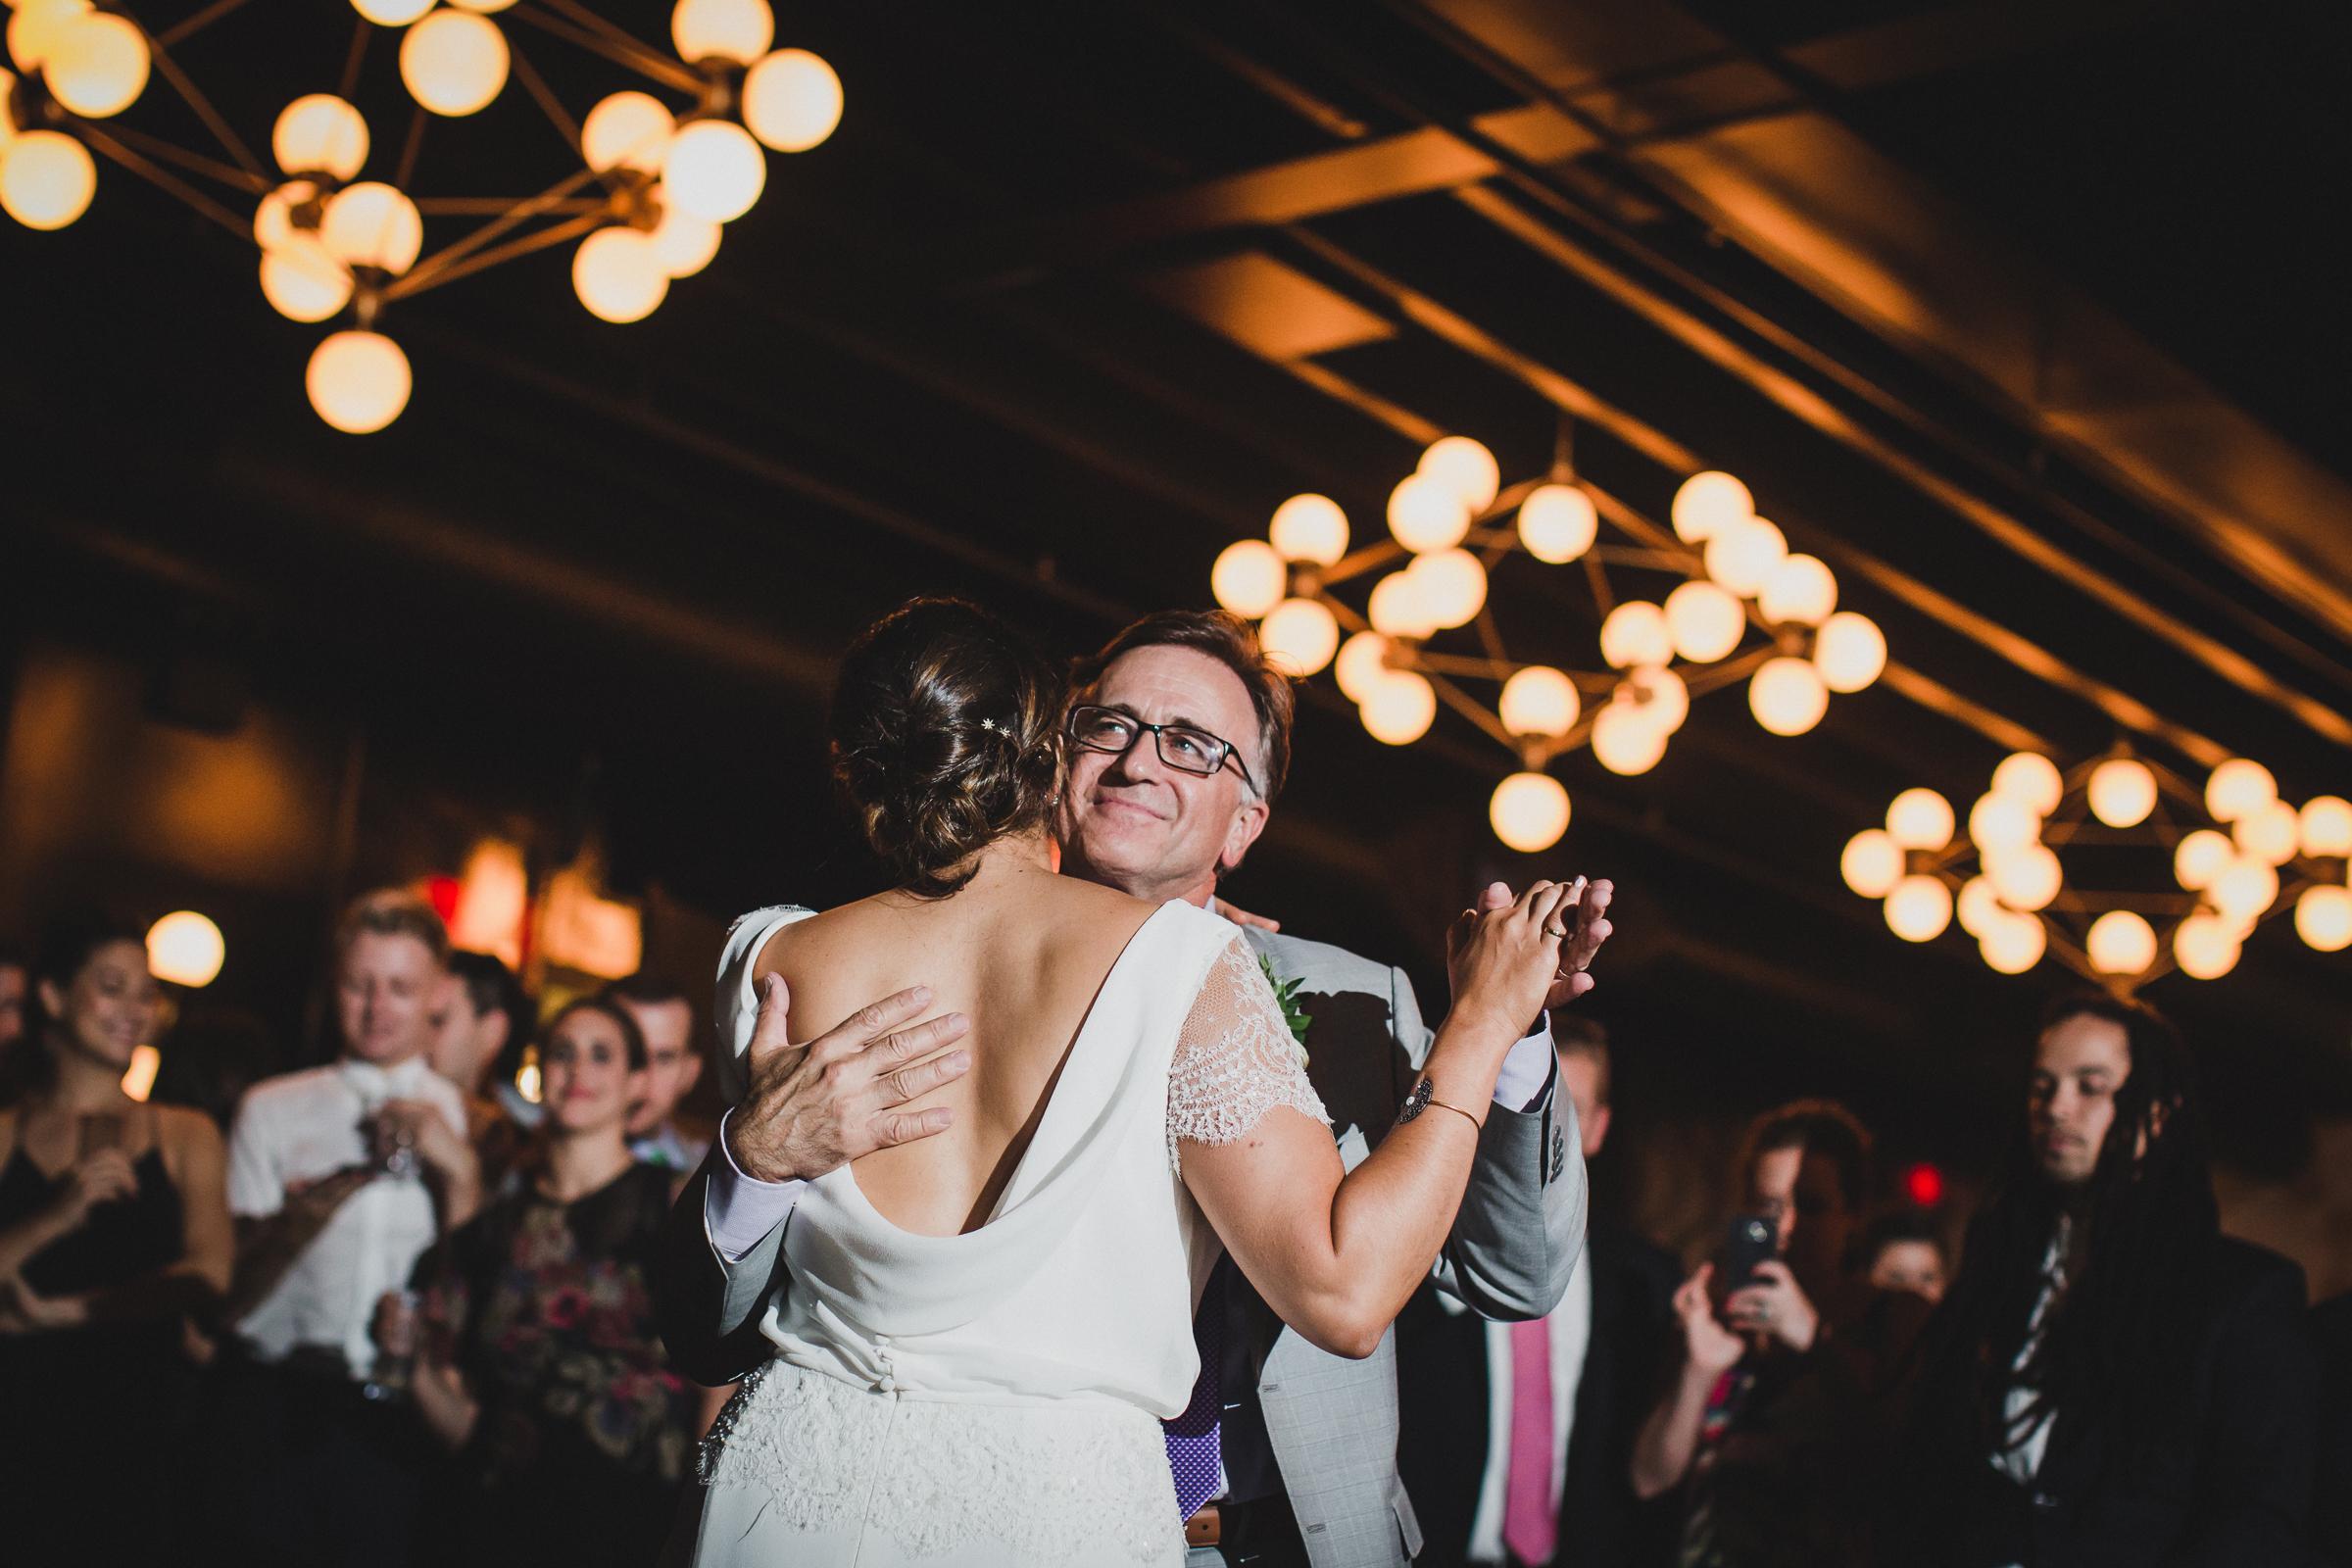 New-York-Documentary-Wedding-Photography-Best-Of-2017-by-Elvira-Kalviste-Photography-49.jpg